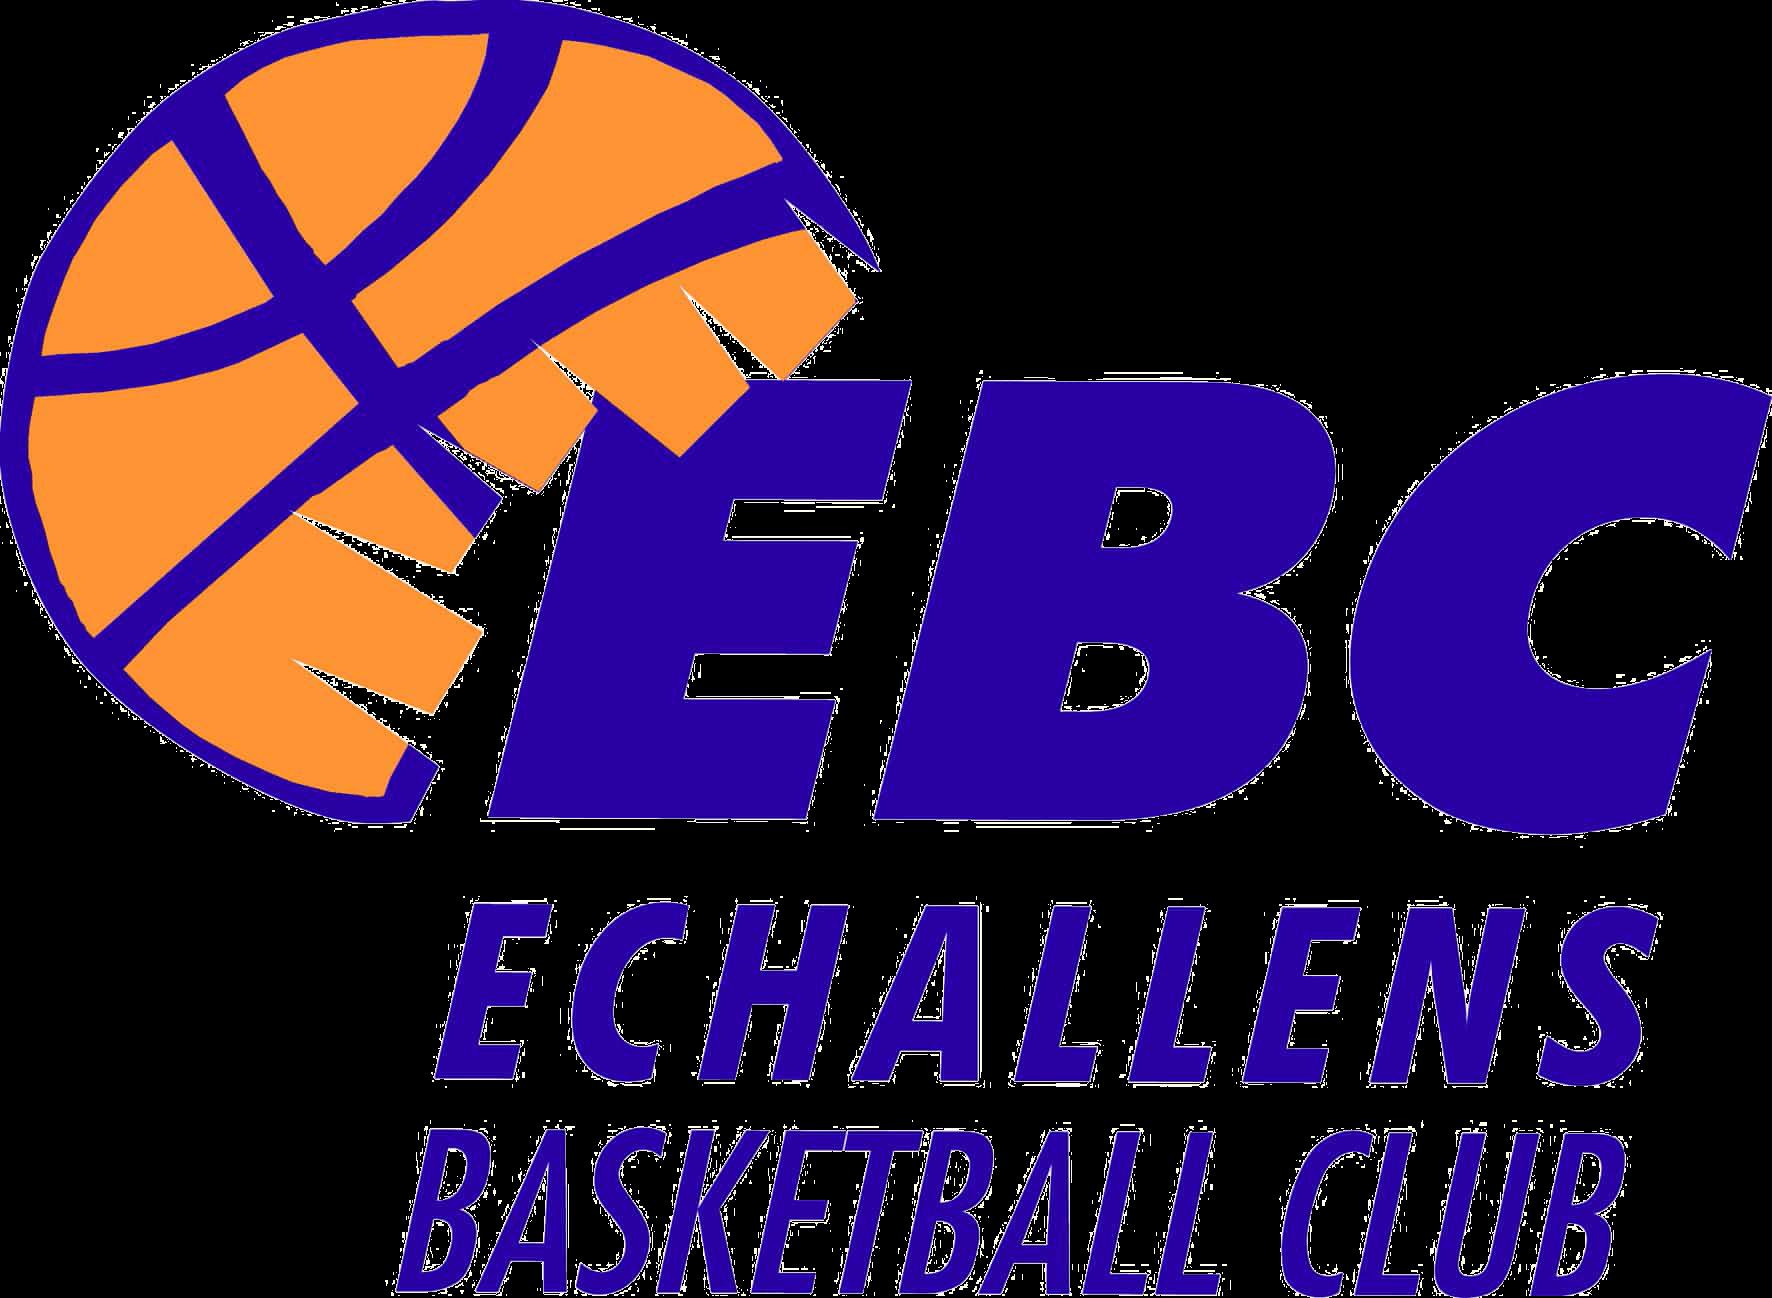 echallens basket logo